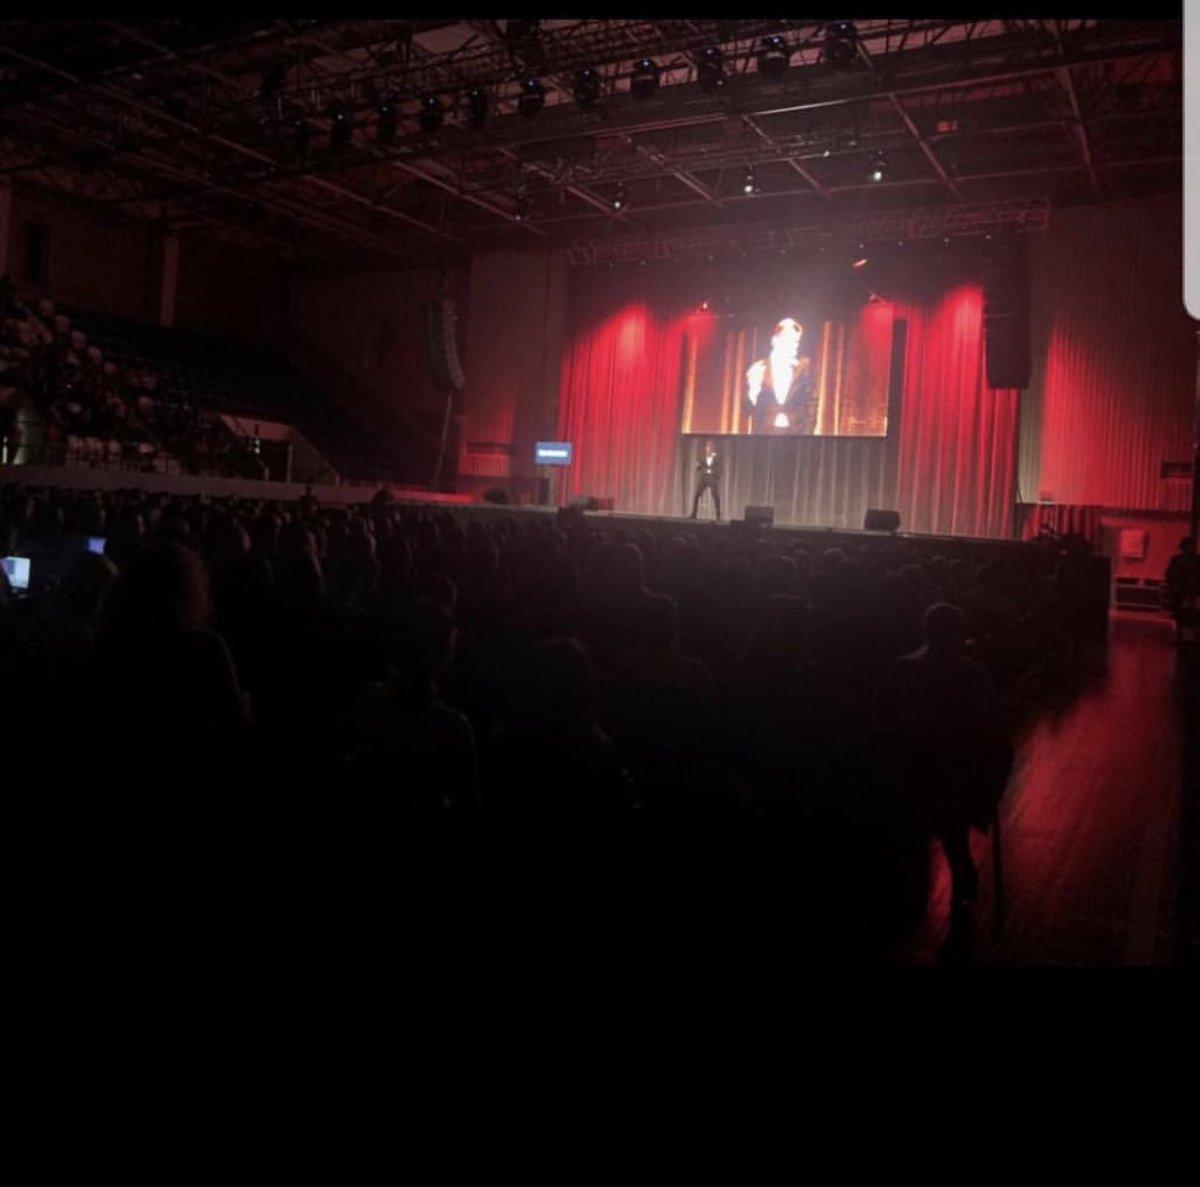 Очень маленький я говорю огромное СПАСИБО за сегодняшний концерт в Иркутске. ???????????????????????????????????? https://t.co/qOKjQzzVS5